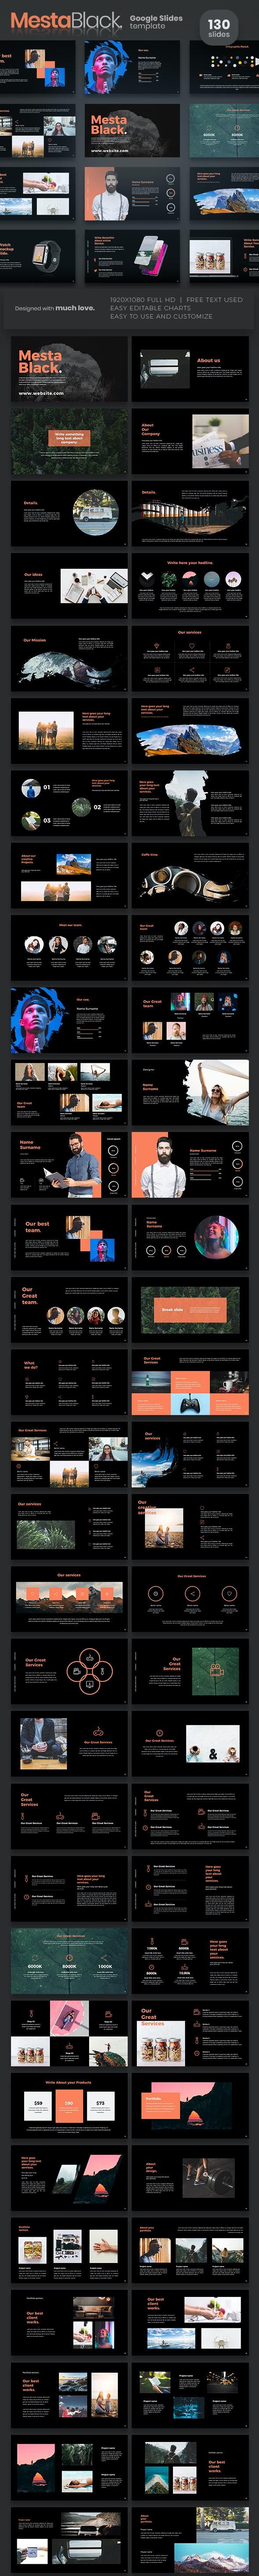 Mesta Black Google Slides - Google Slides Presentation Templates